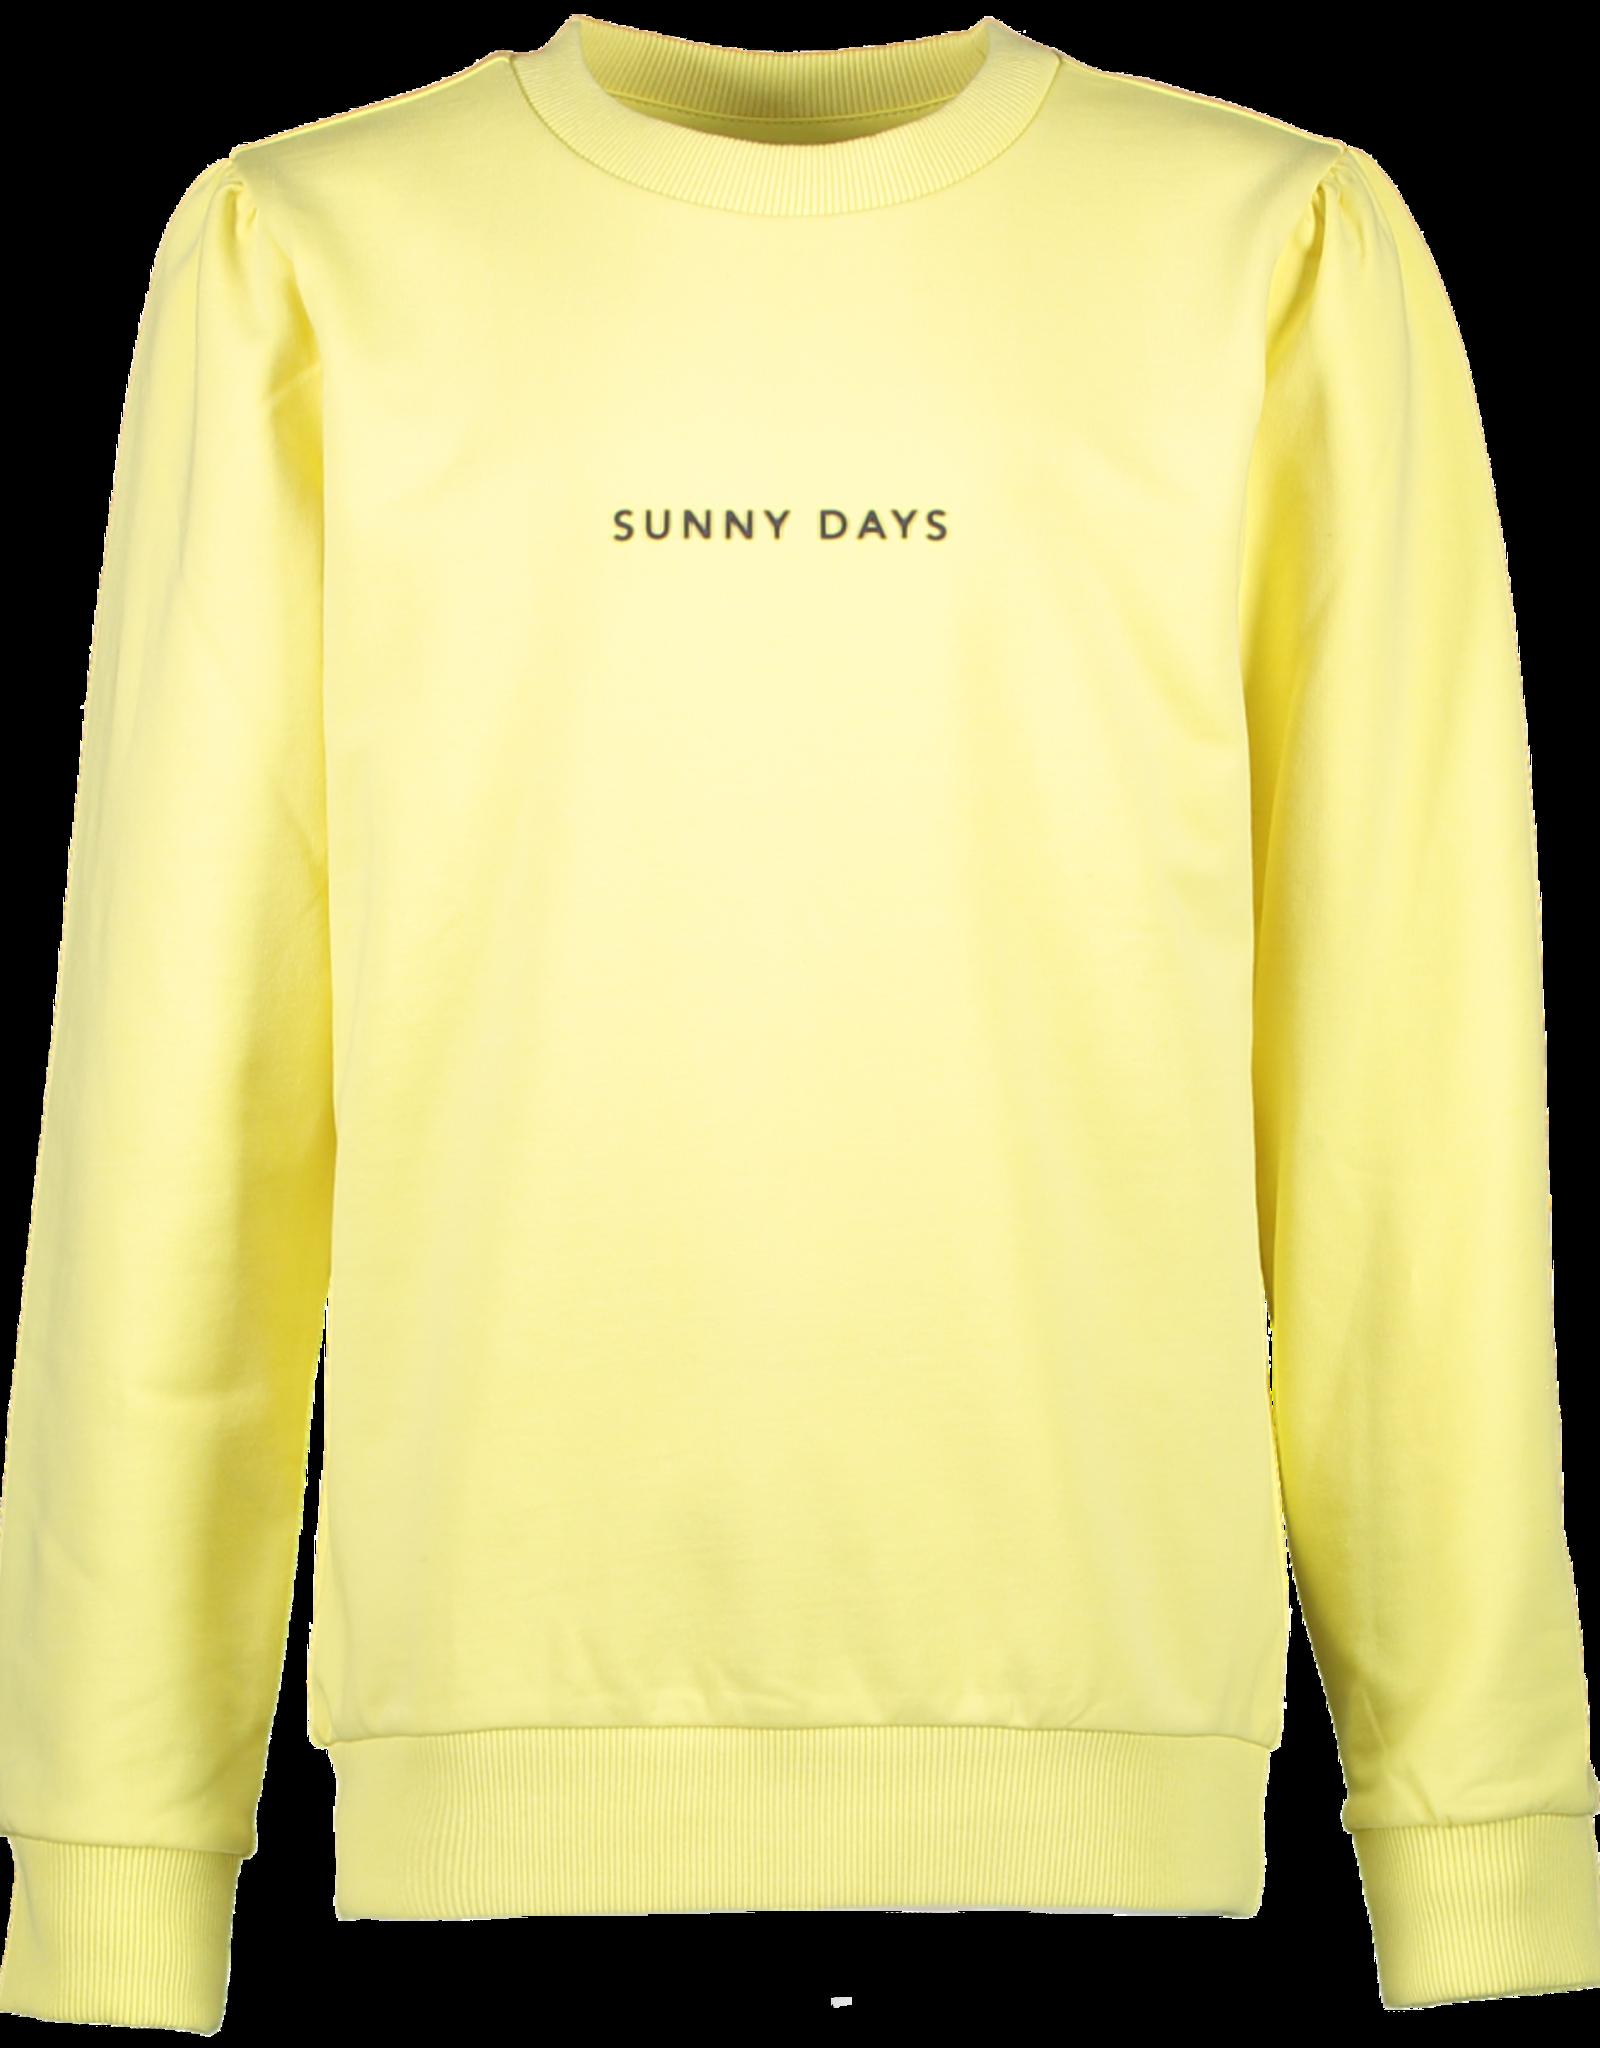 Cars Cars Scarlet lichtgele sweater 'Sunny Days'